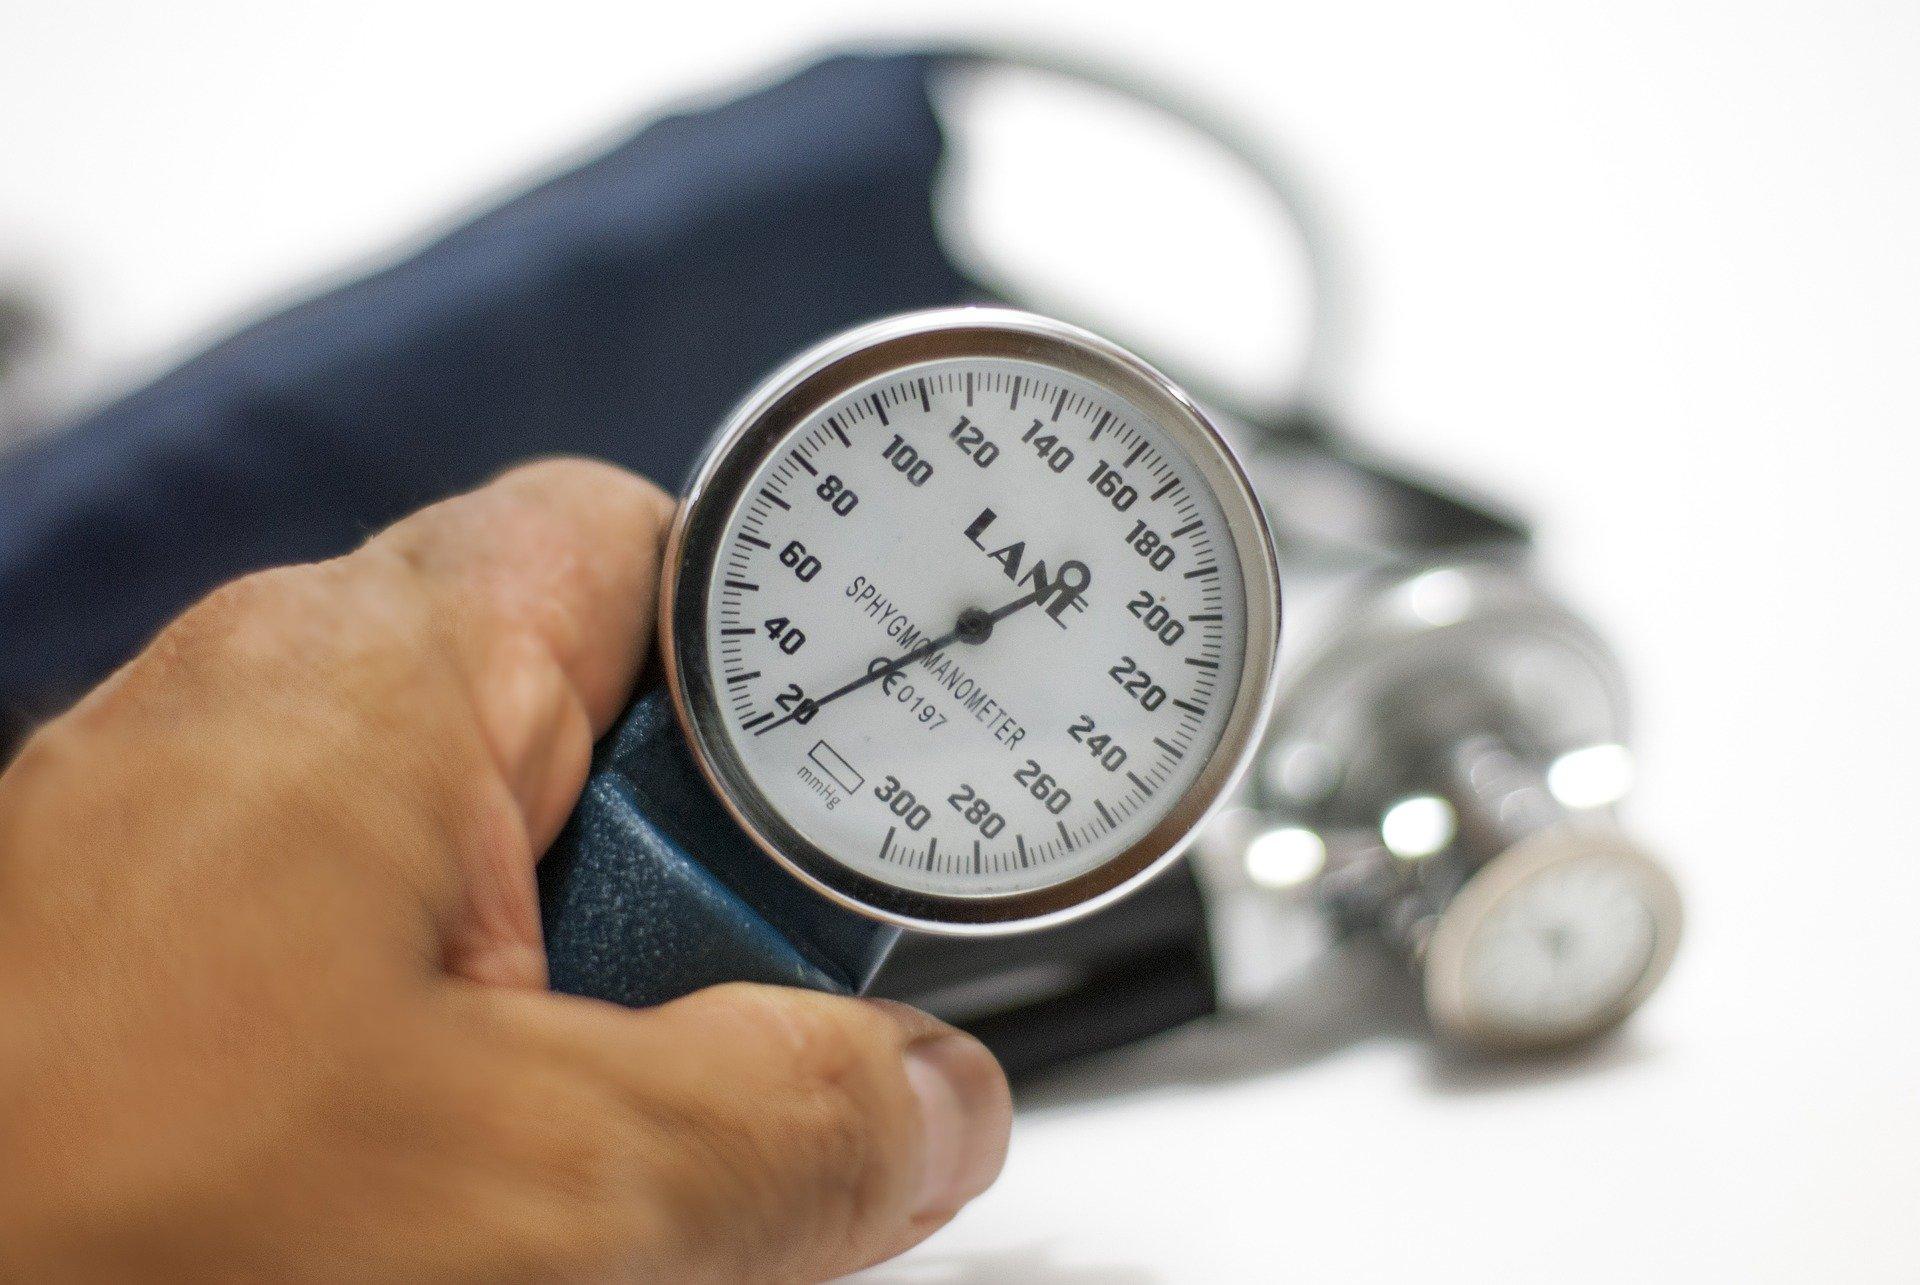 Sac infirmier libéral : que contient-il ?